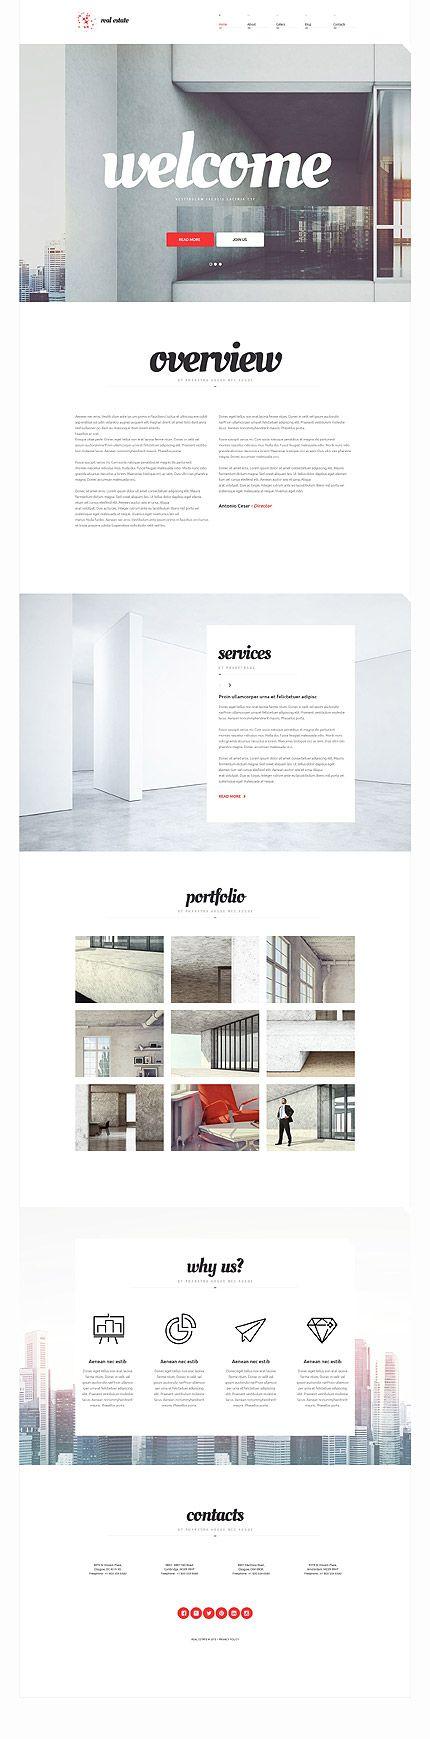 Template 54654 - Real Estate Responsive WordPress Theme